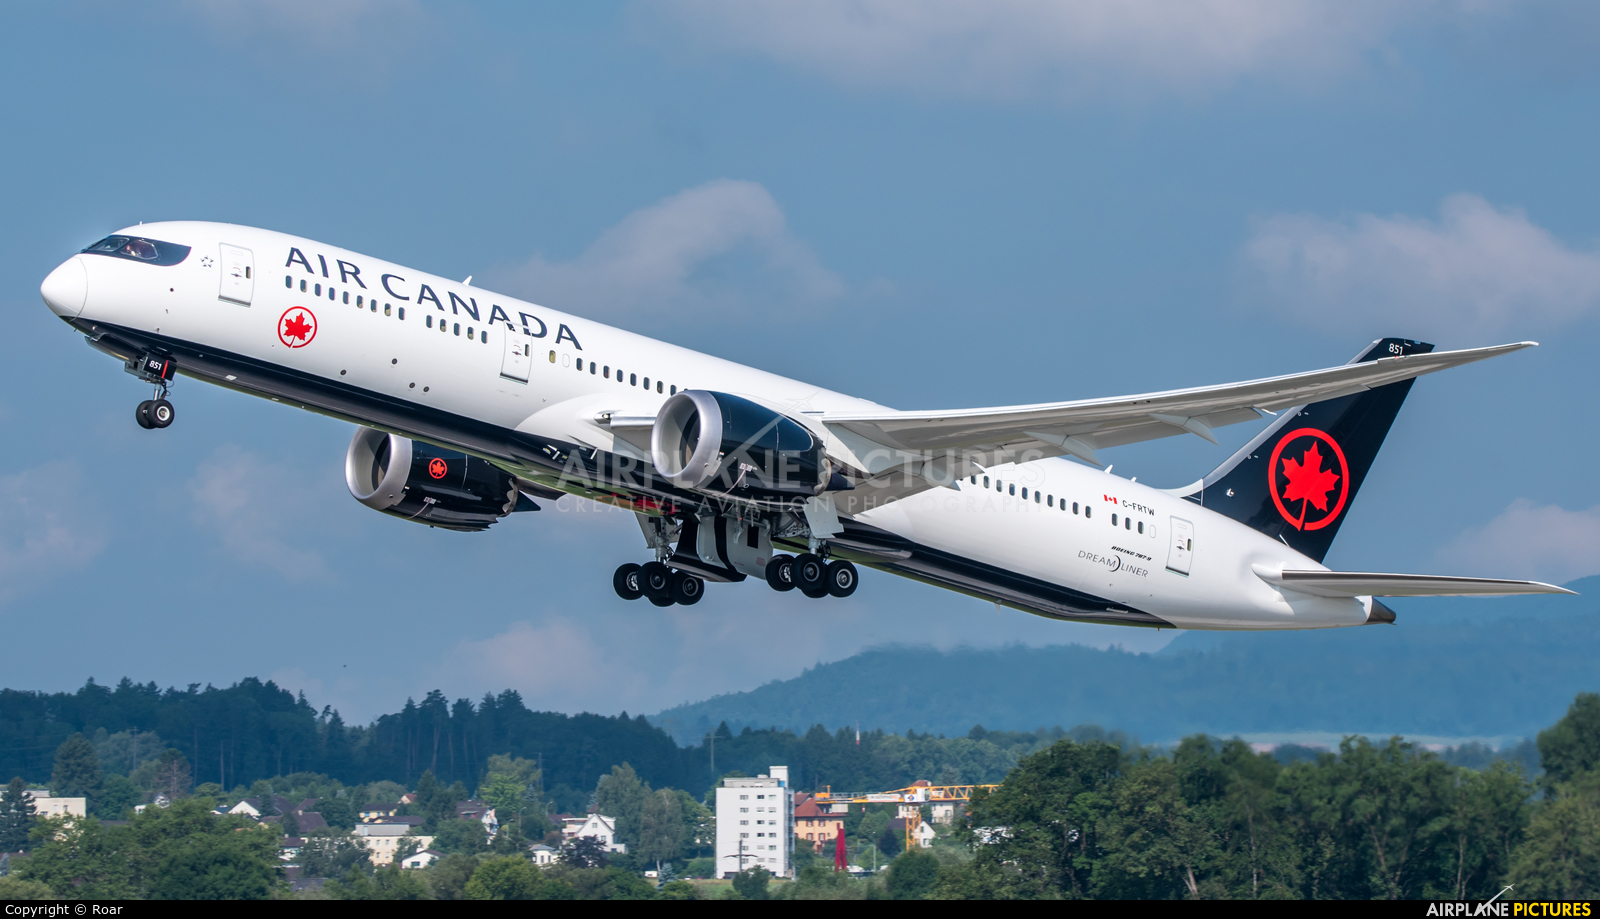 Air Canada C-FRTW aircraft at Zurich